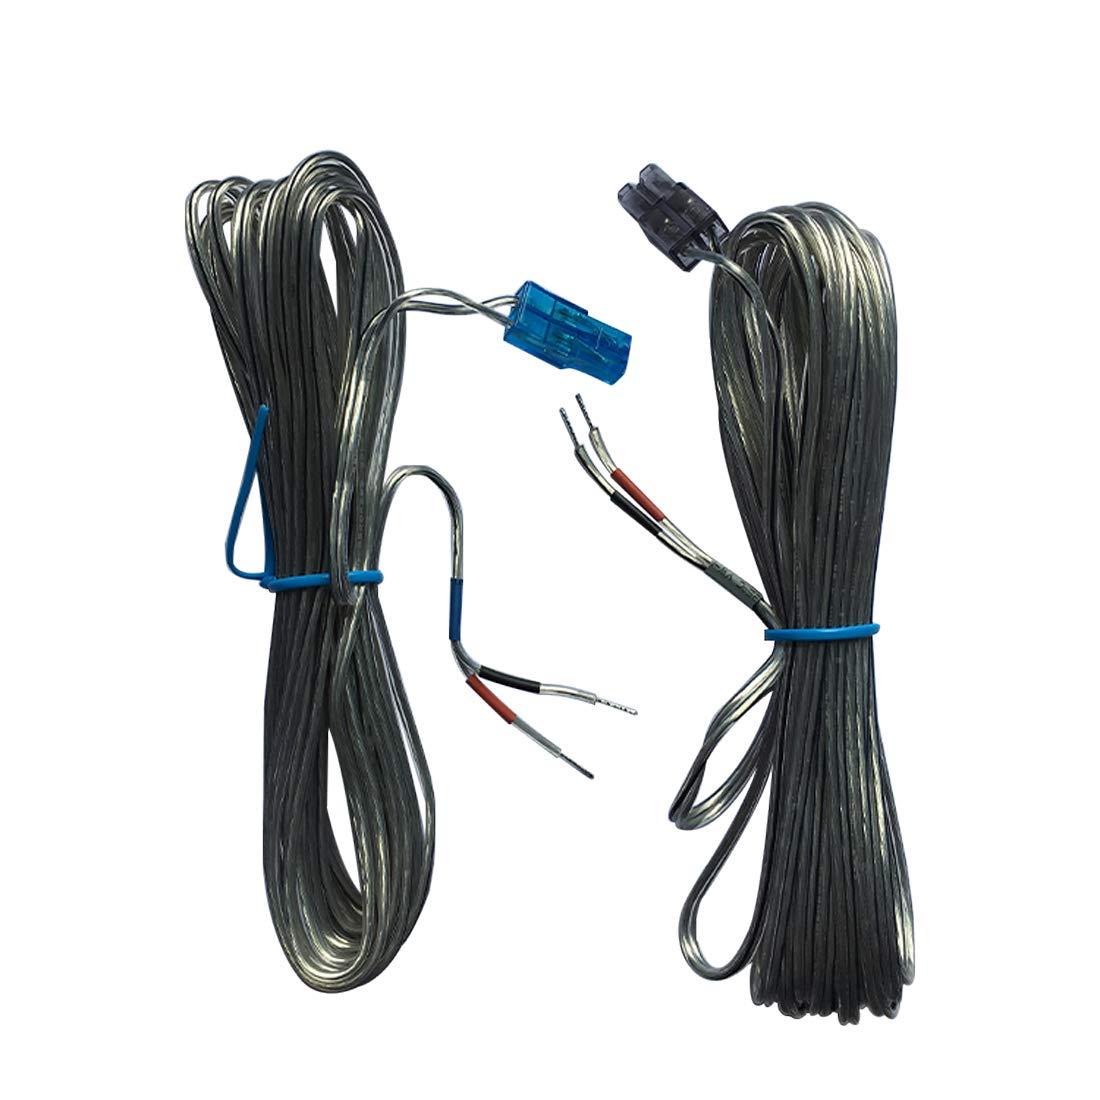 Speaker Cables/Wires AH81-02137A for Samsung Speaker SWA6000 SWA-8500S SWA-8500S/ZA SWA-9000S/ZA SWA-9100S/ZA